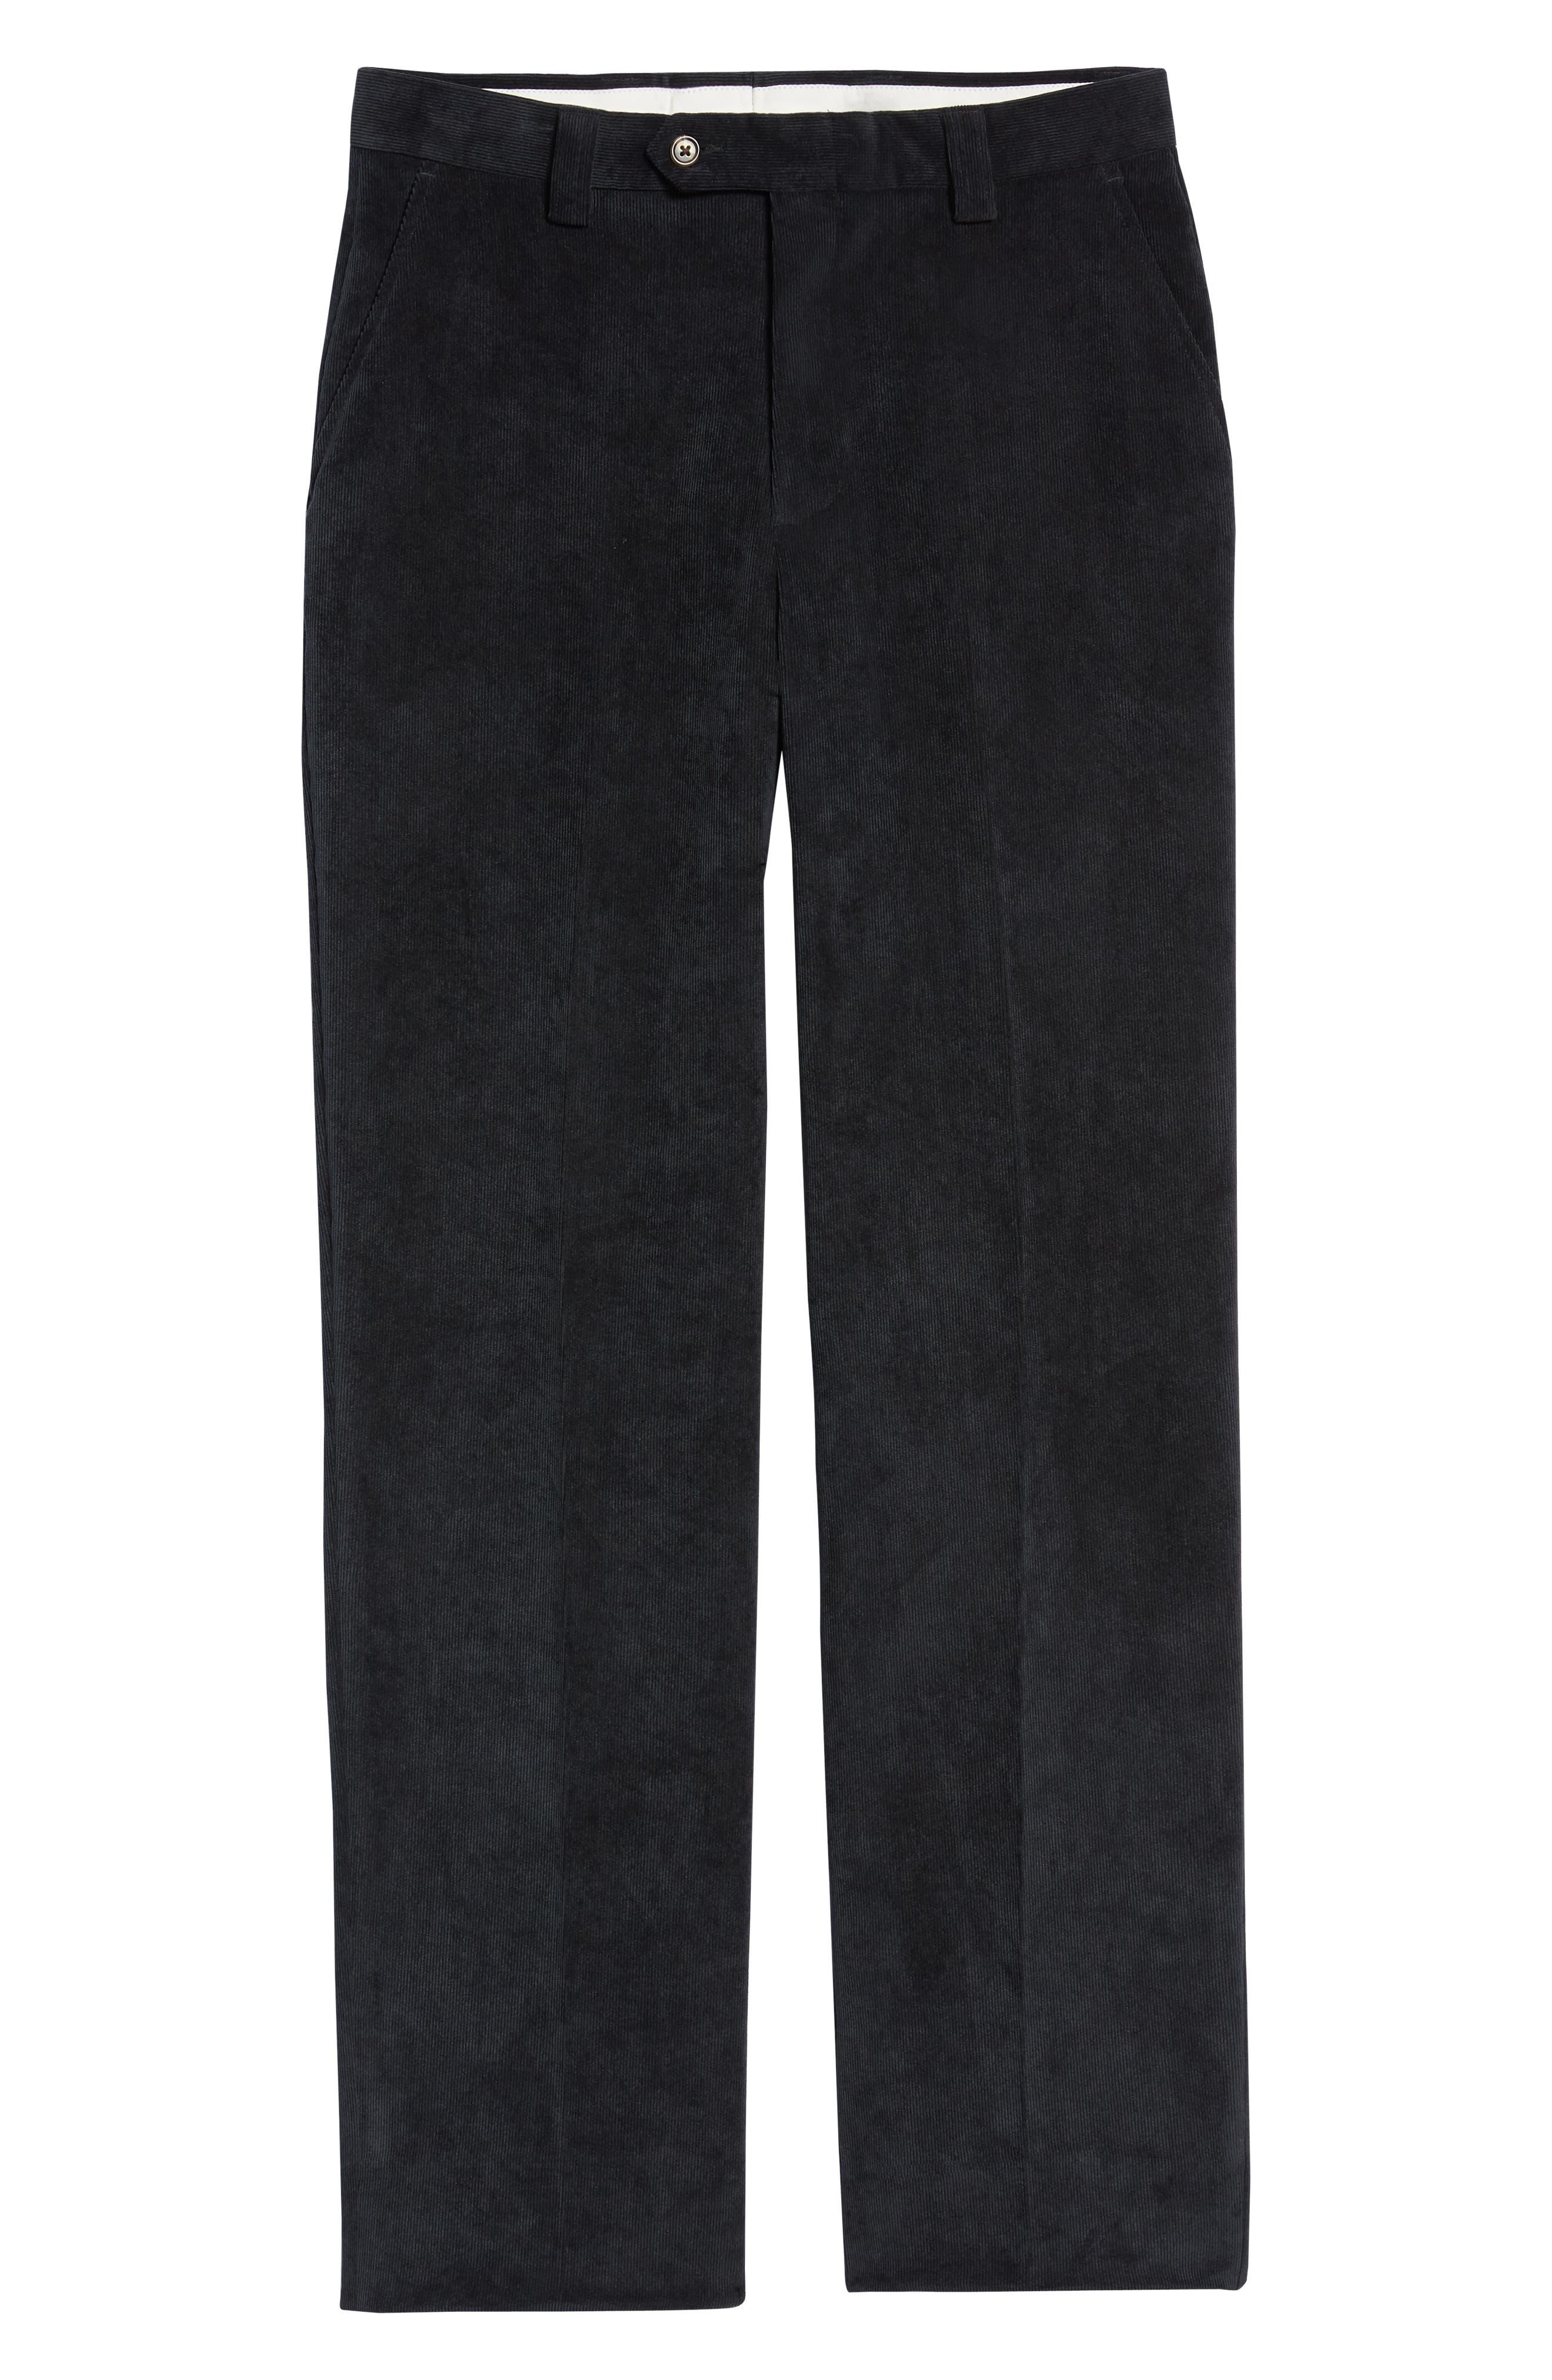 Classic Fit Flat Front Corduroy Trousers,                             Alternate thumbnail 6, color,                             BLACK